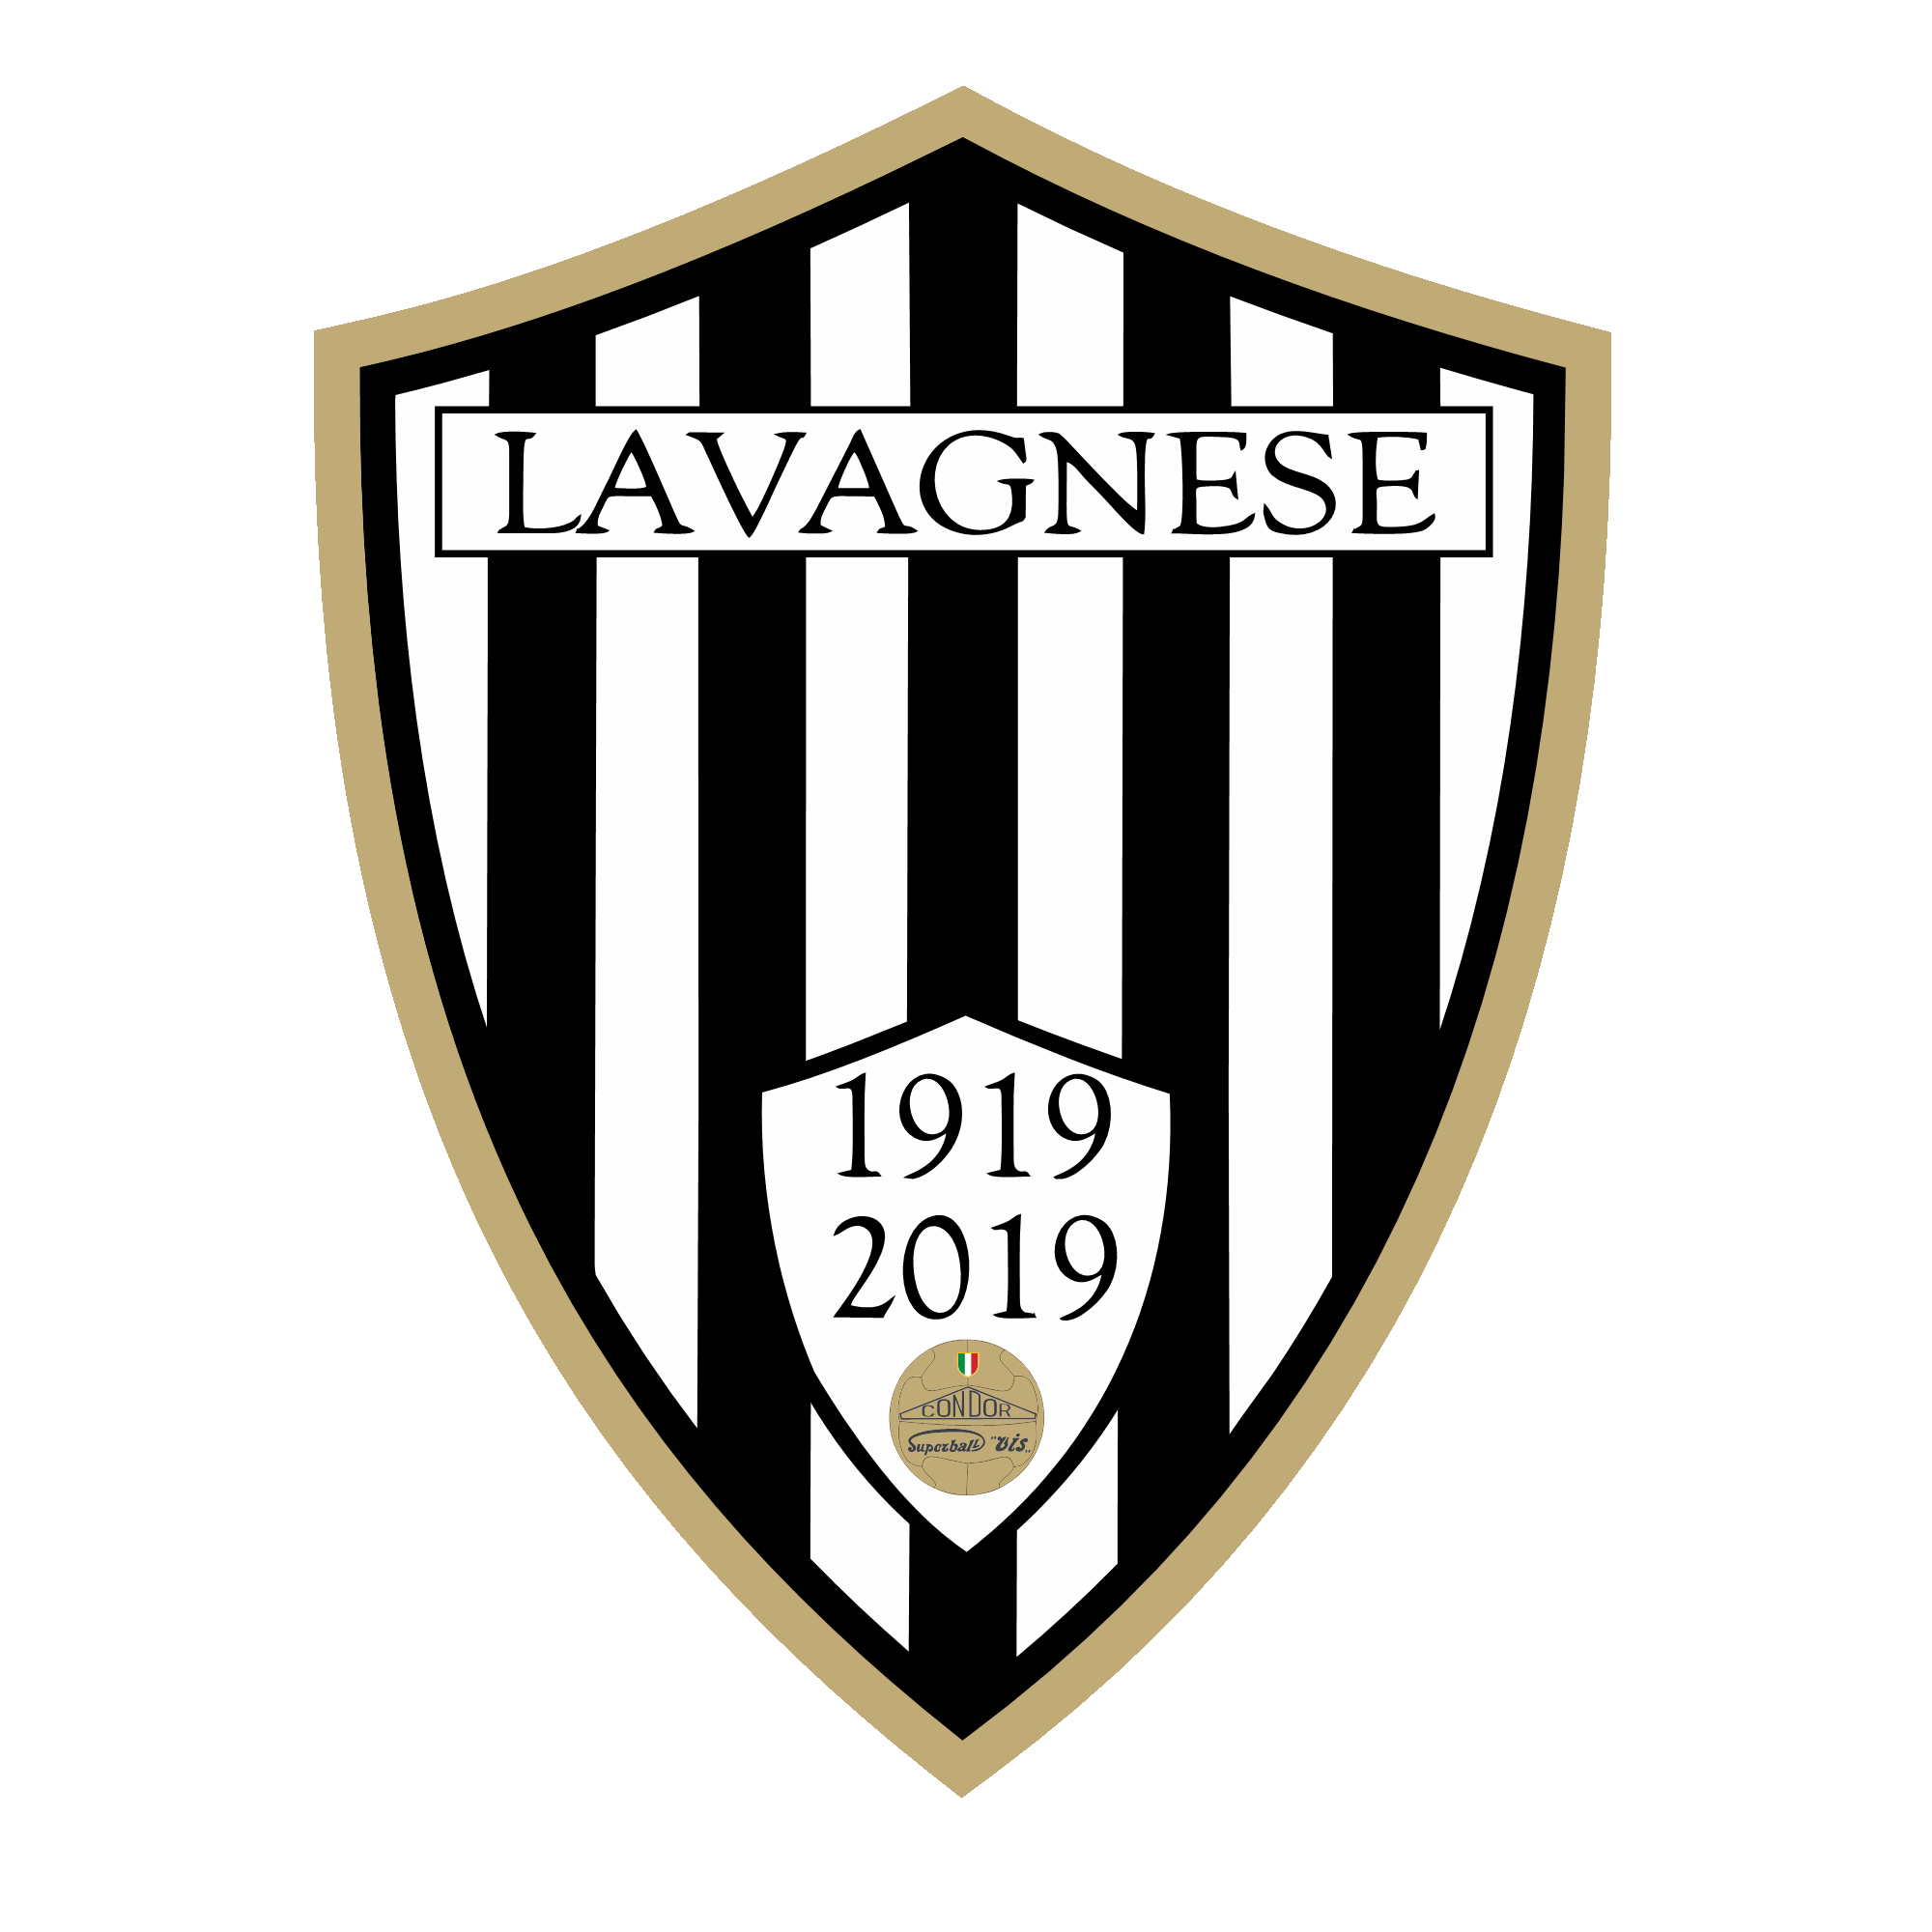 Lavagnese logo